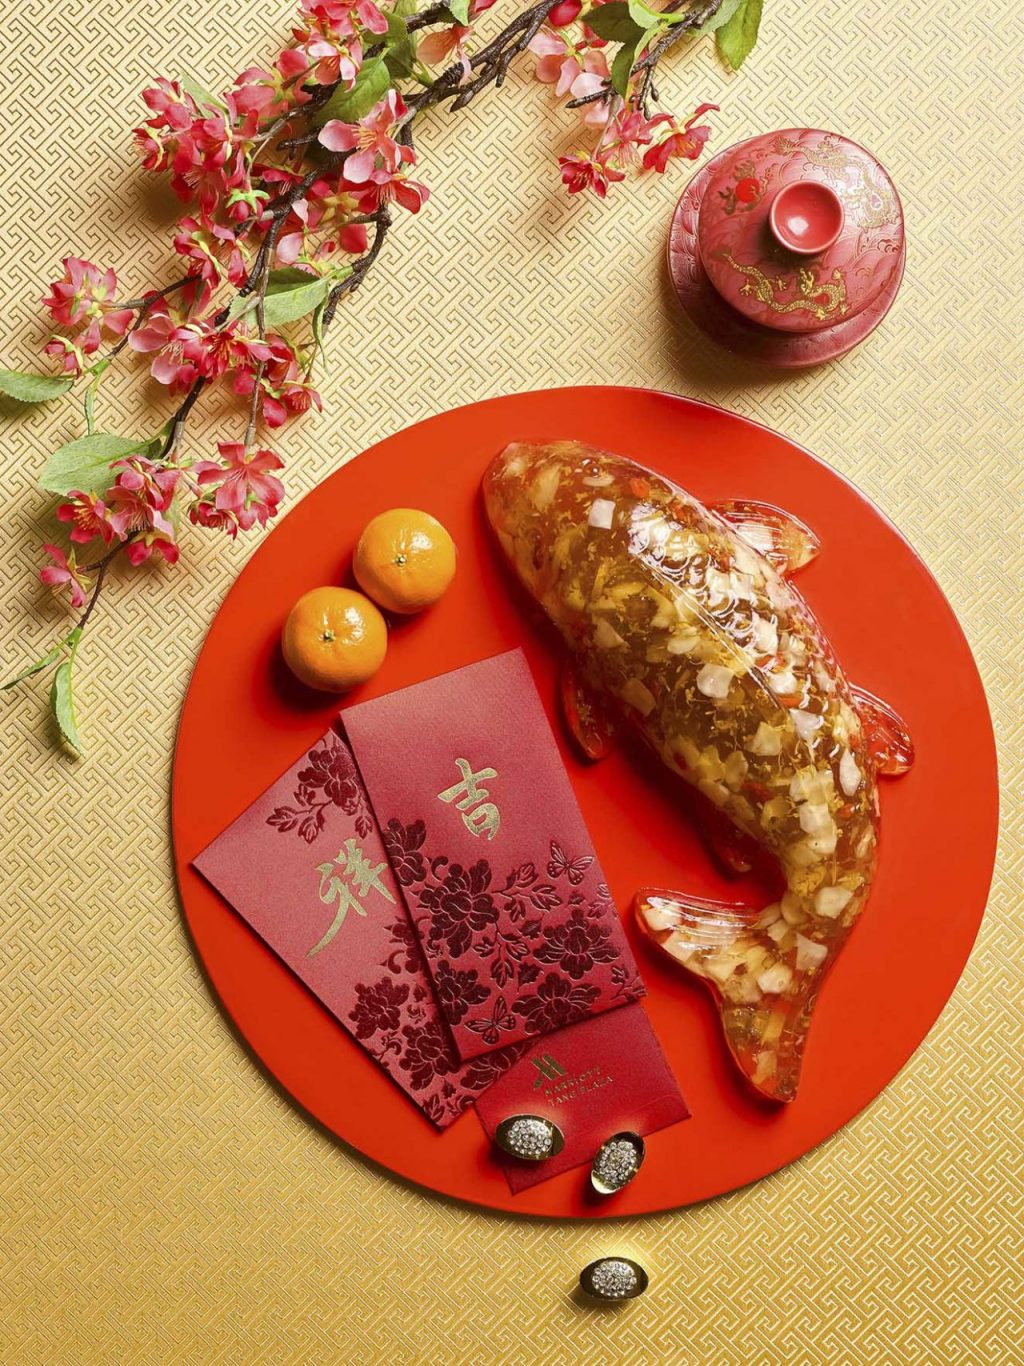 Osmanthus-Water Chestnut Koi Cake